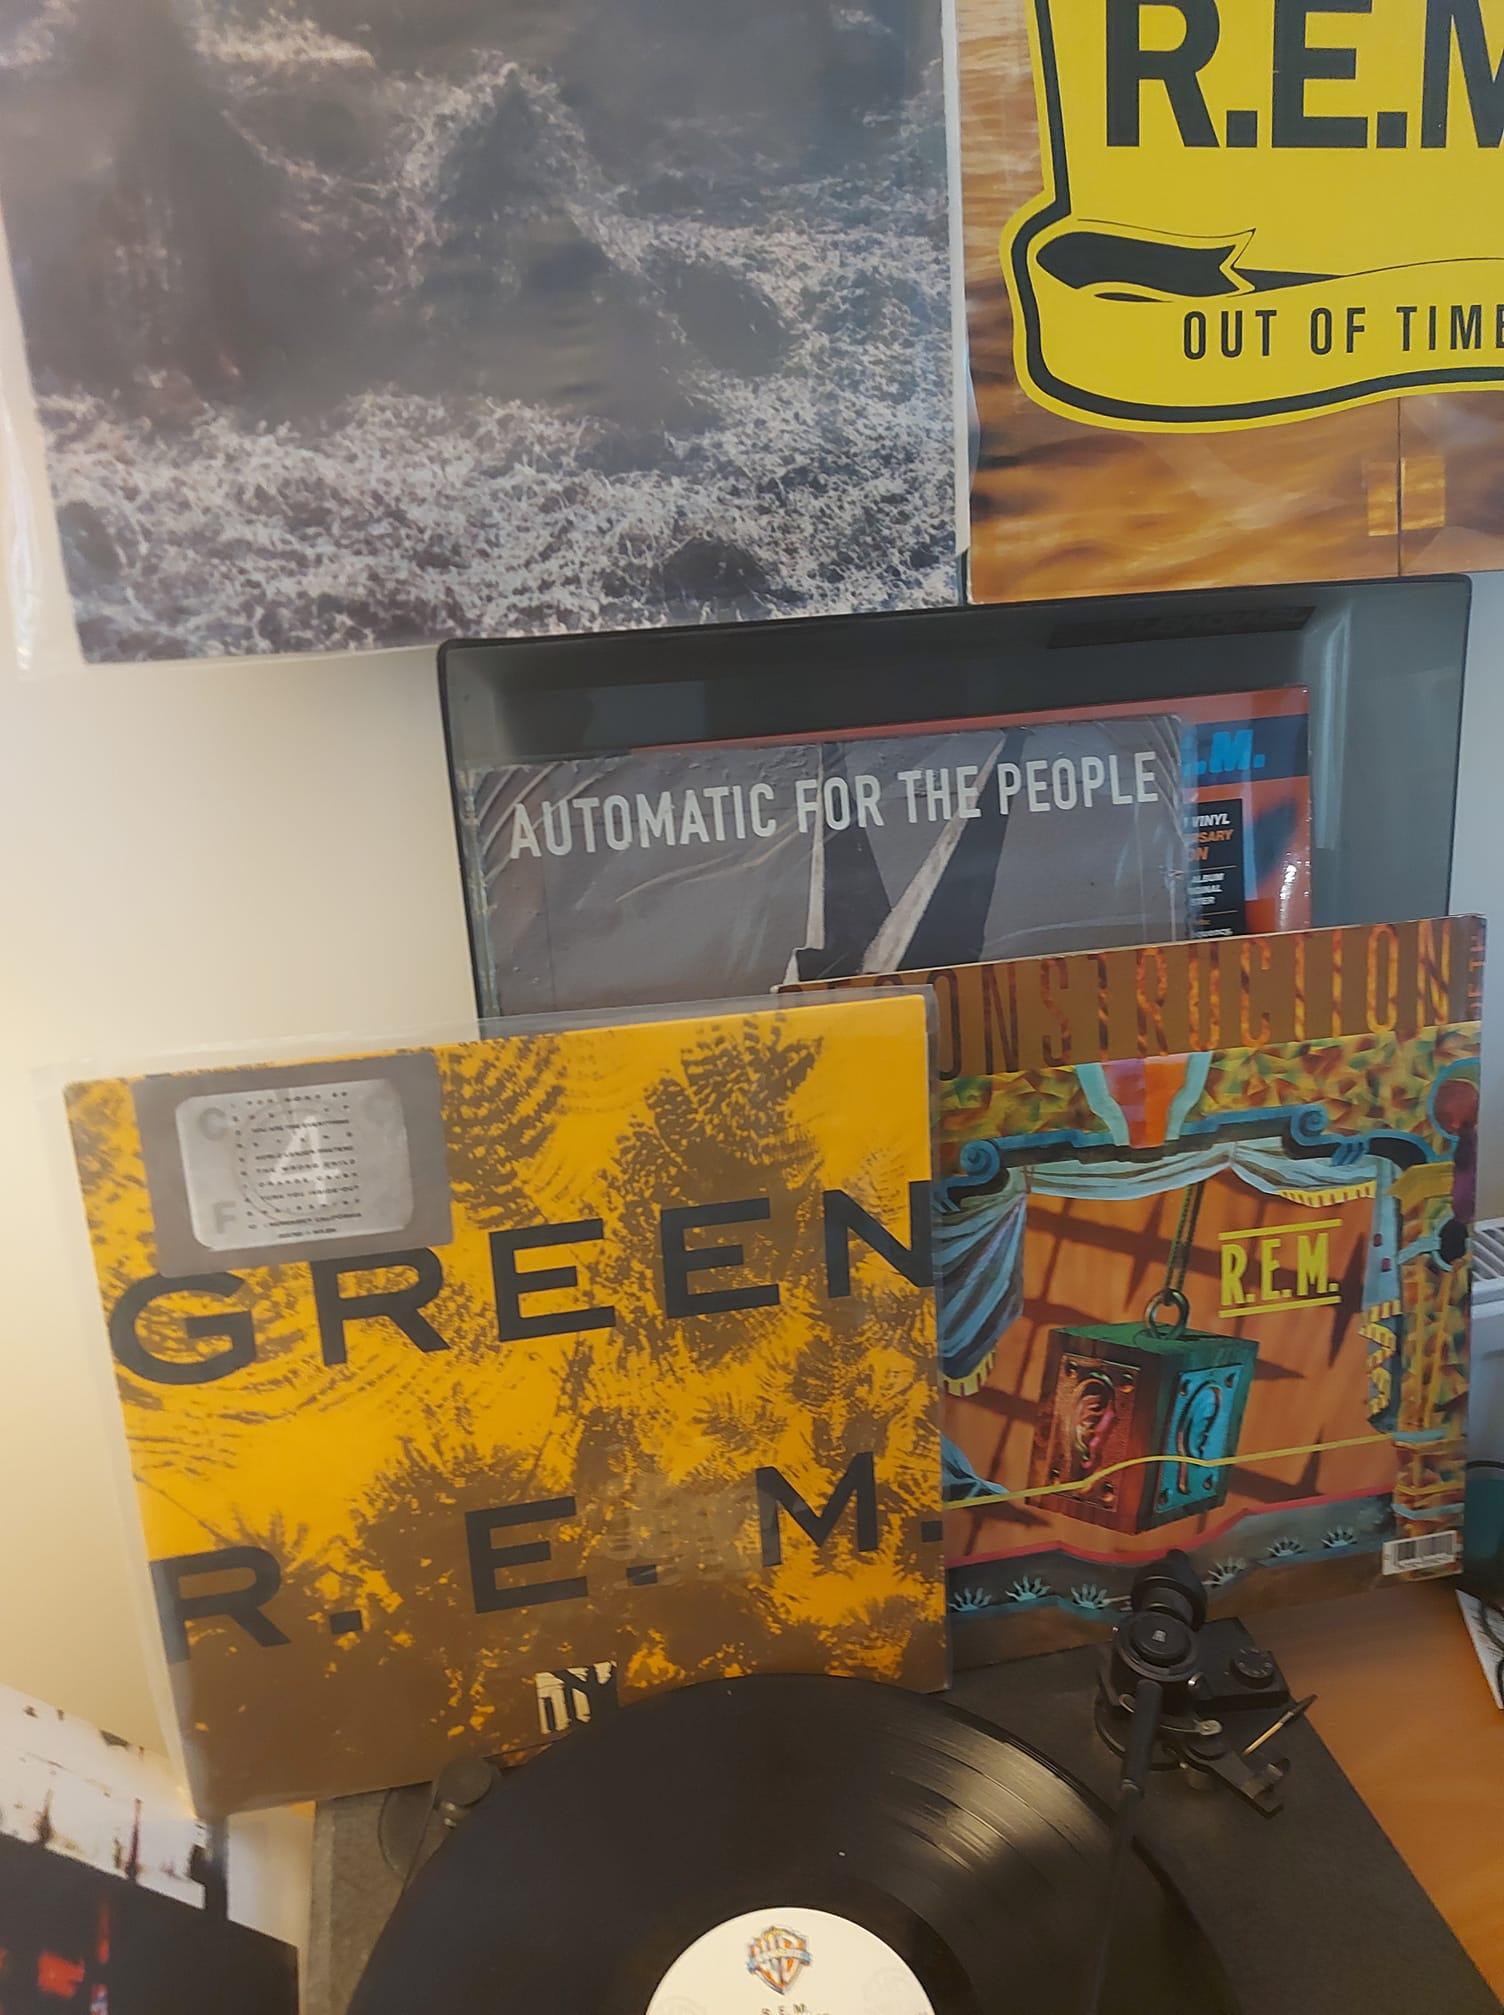 PODCAST: Show Me Magic! R.E.M. discography retrospective Part One